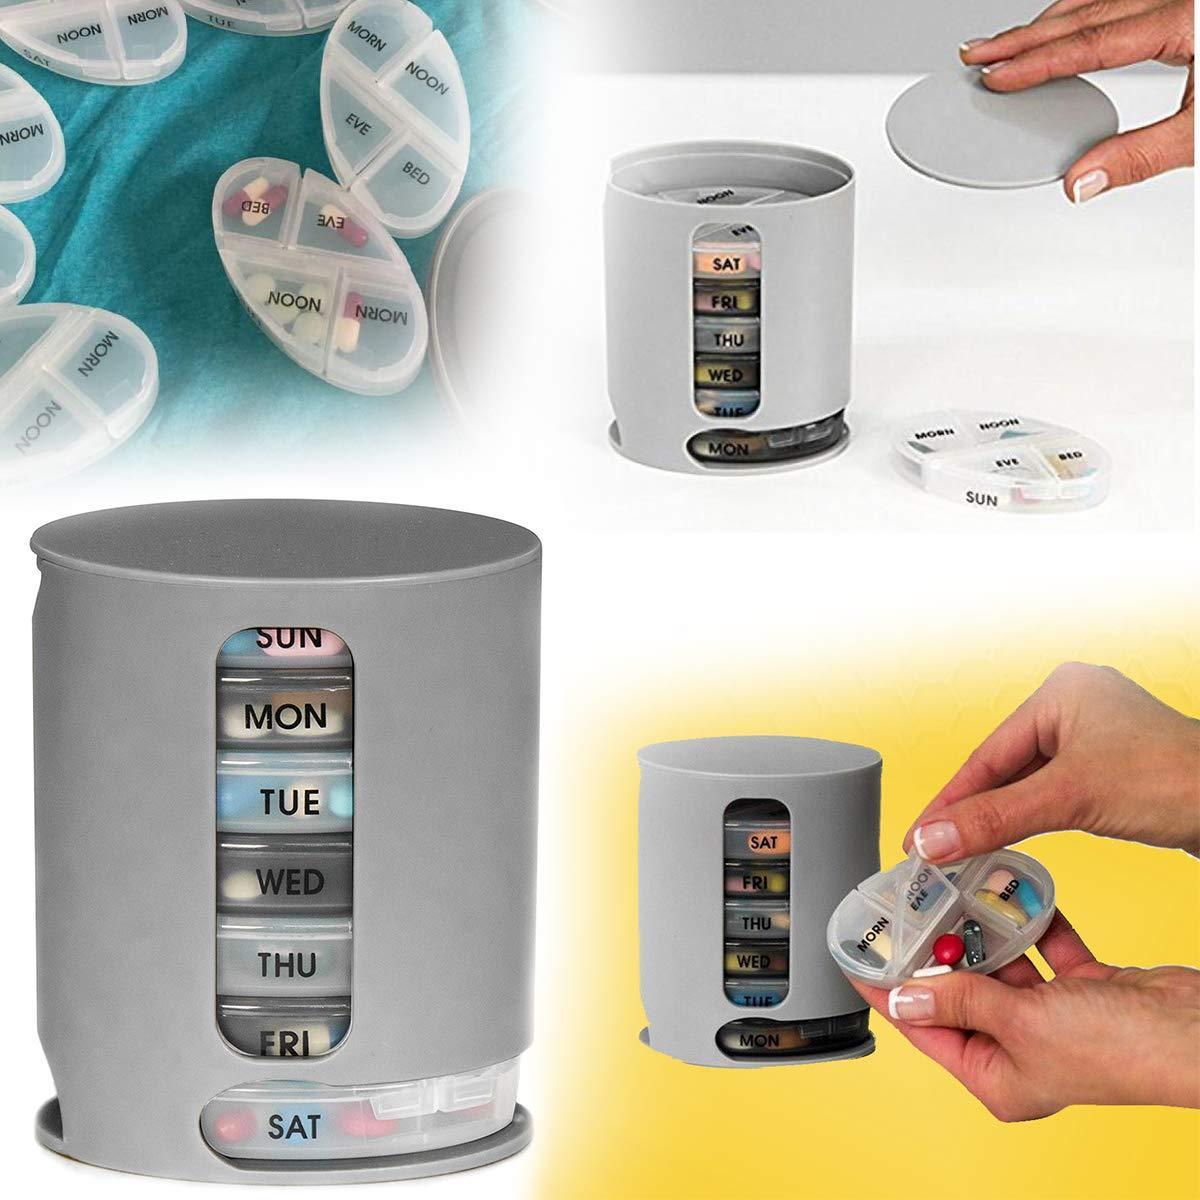 pill-pro-7-day-weekly-tablet-medicine-organizer-box